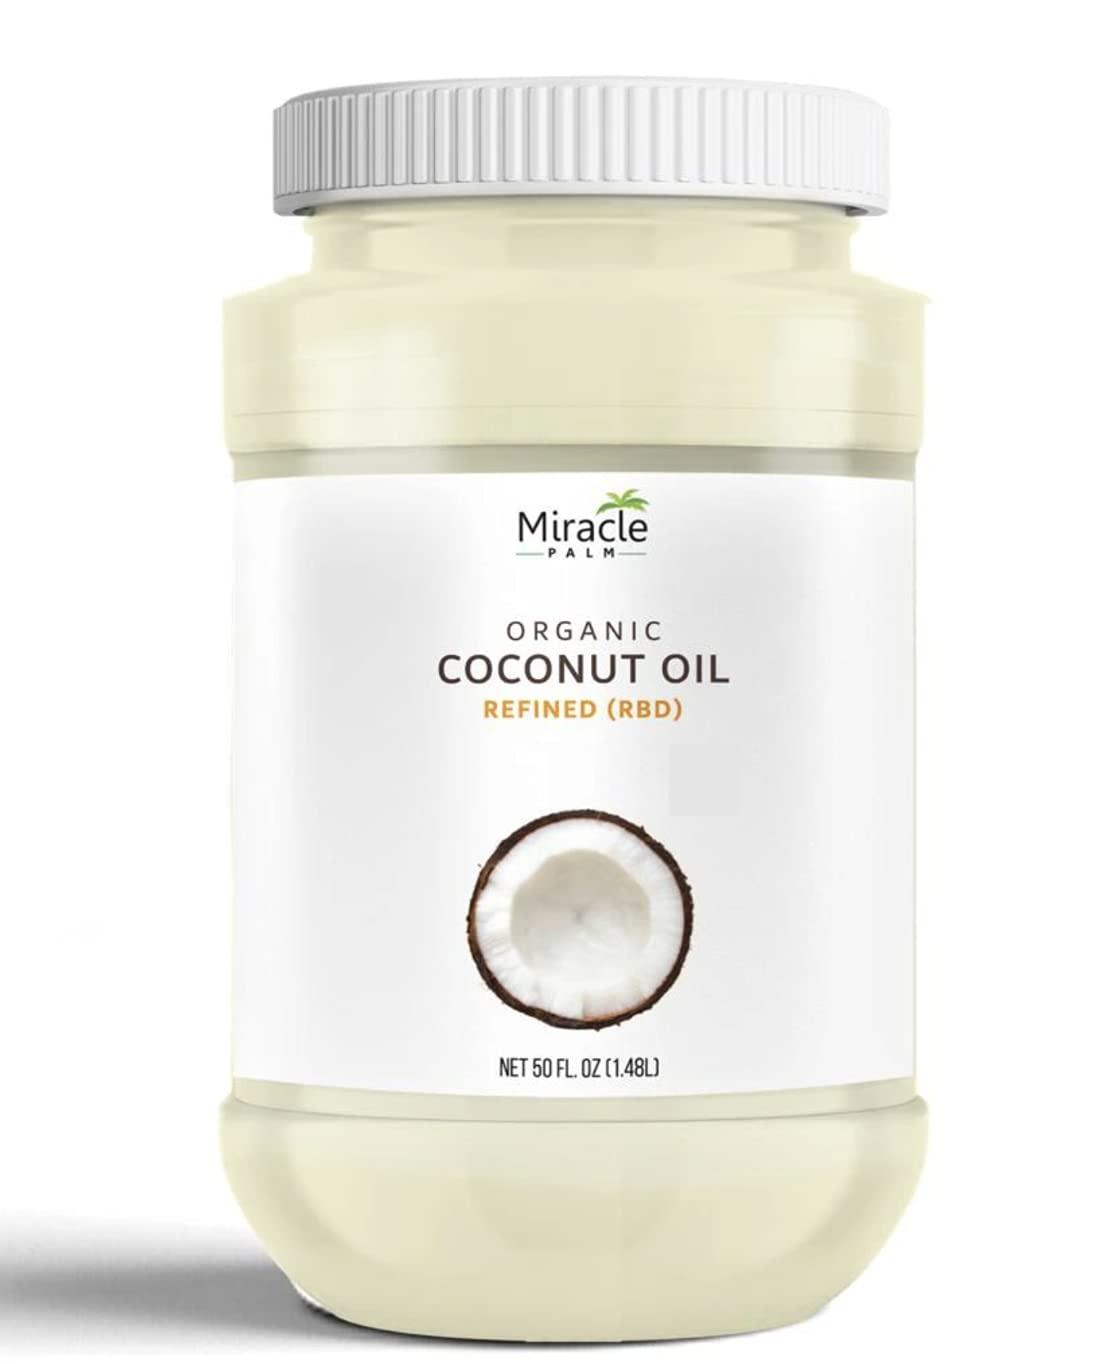 Luxury Super sale Miracle Palm RBD Oil Coconut 50OZ